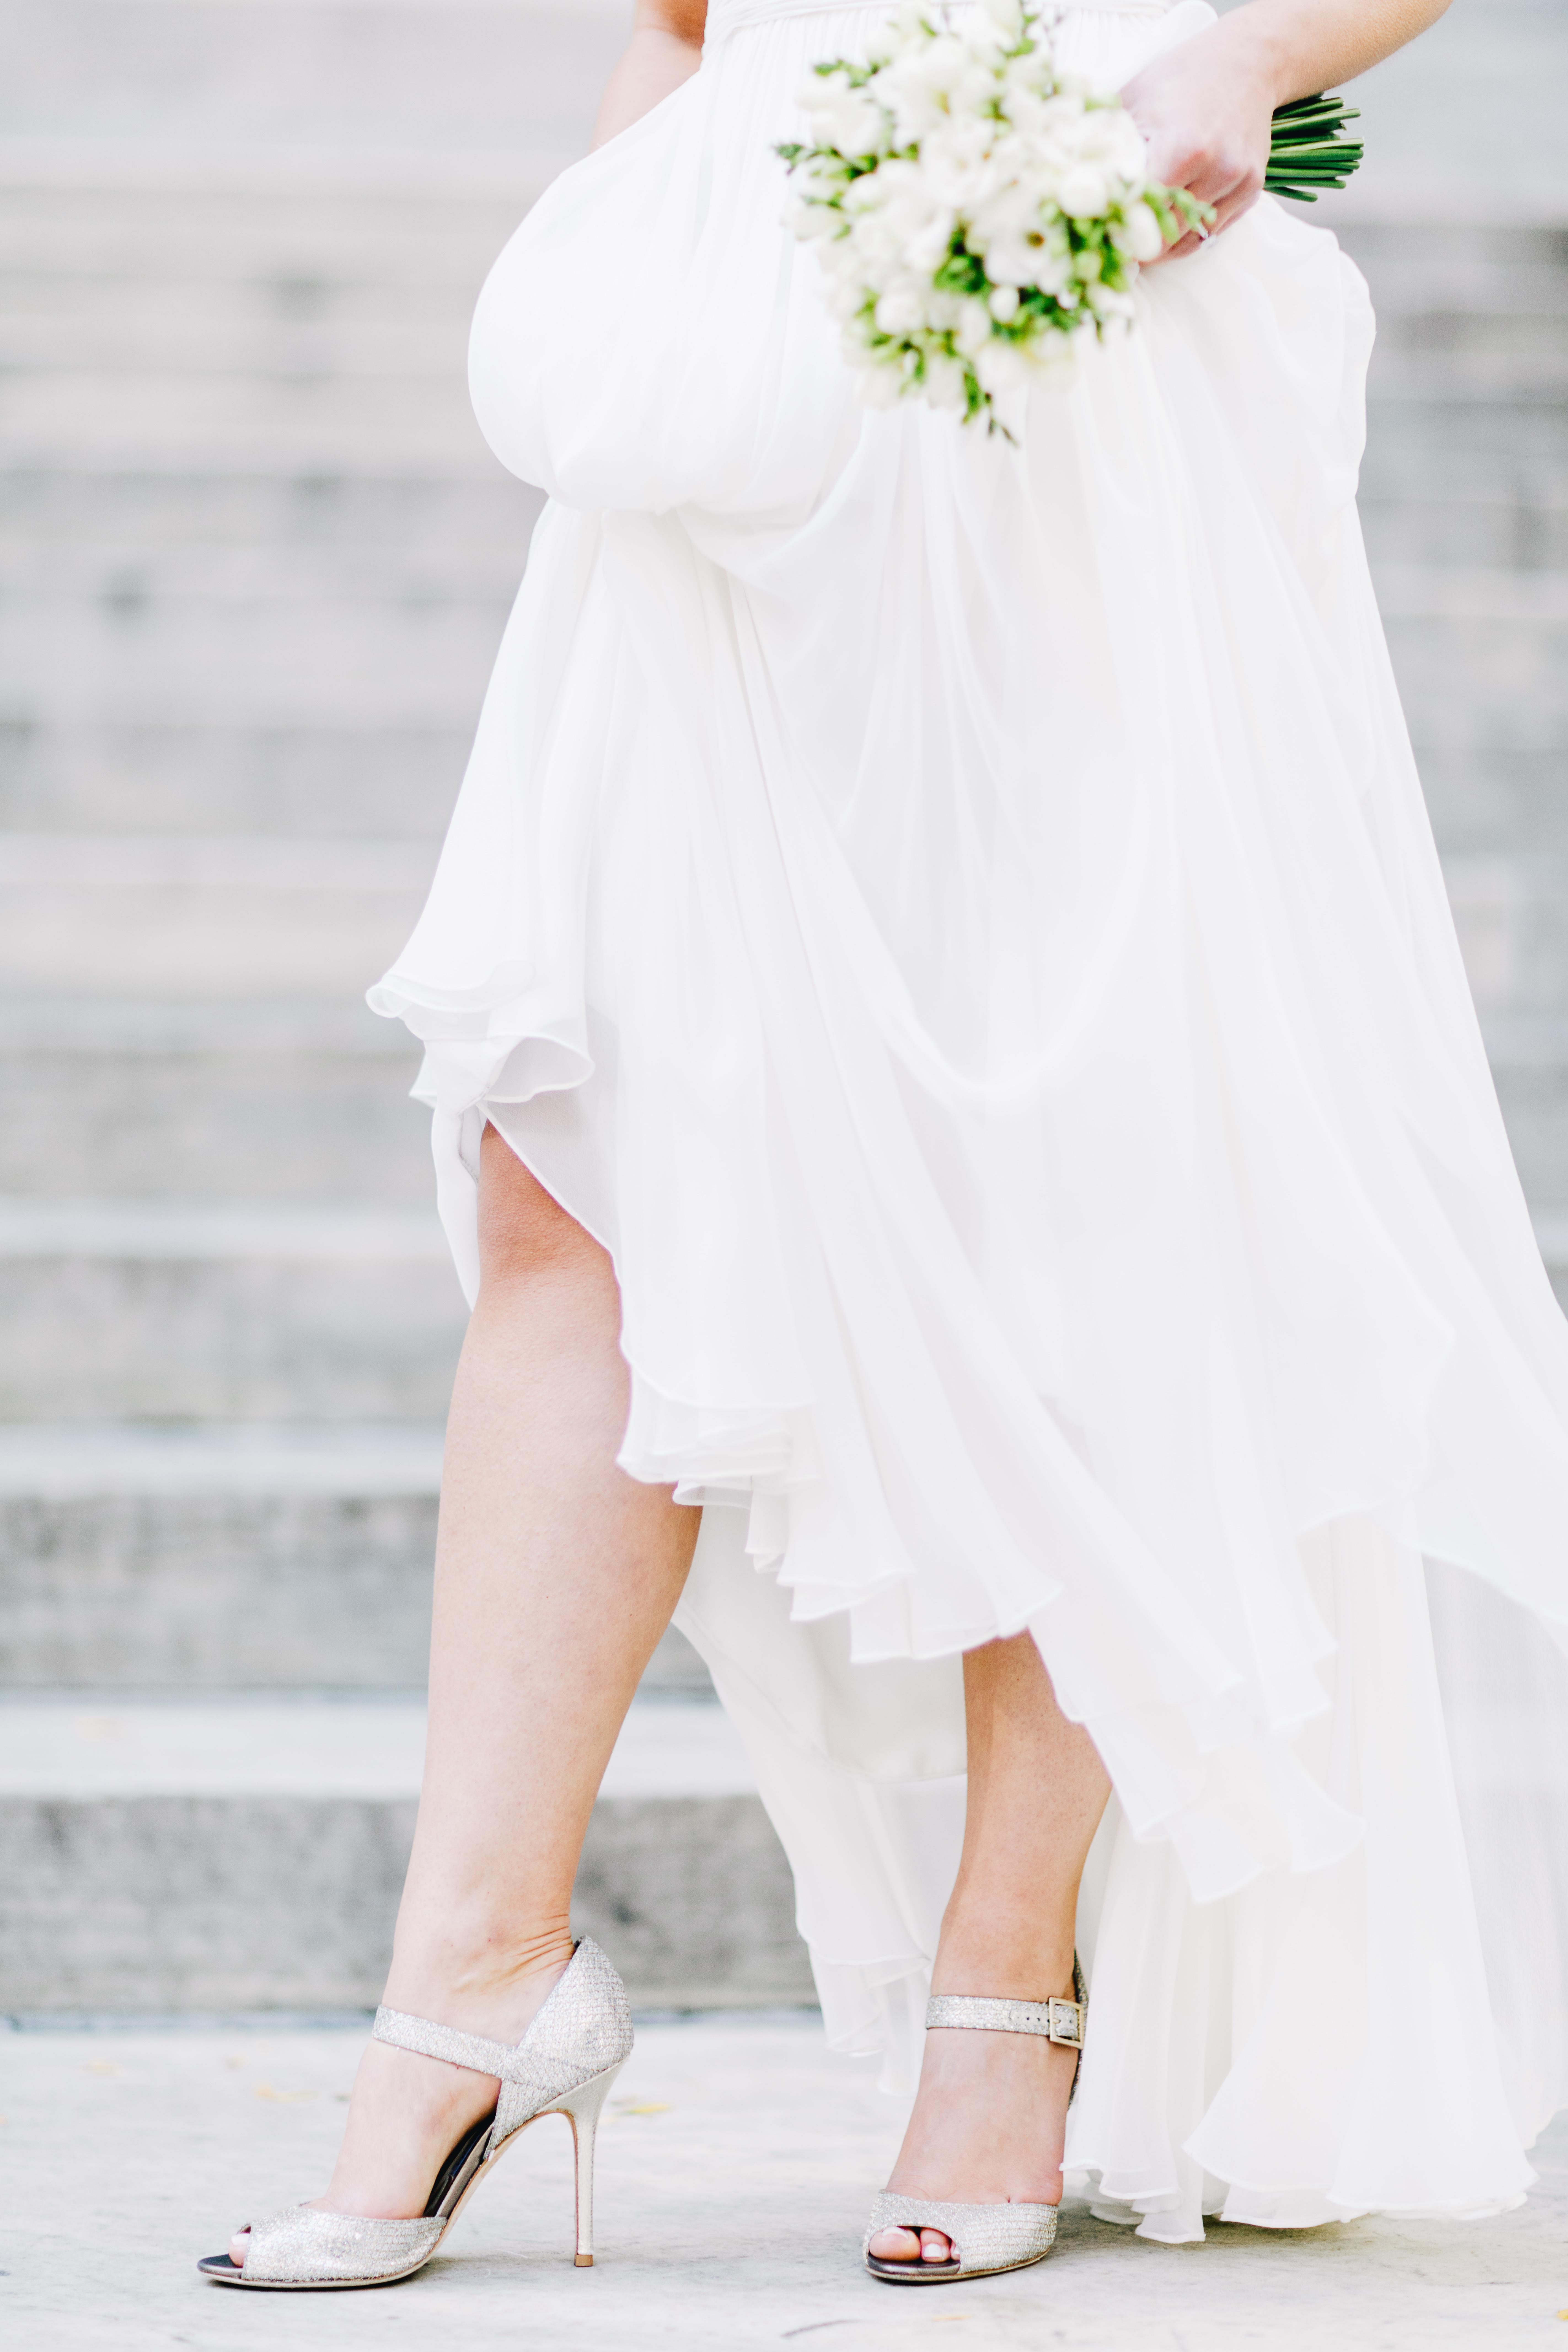 Bryant Park Grill Wedding Jessica + Ariel 0188